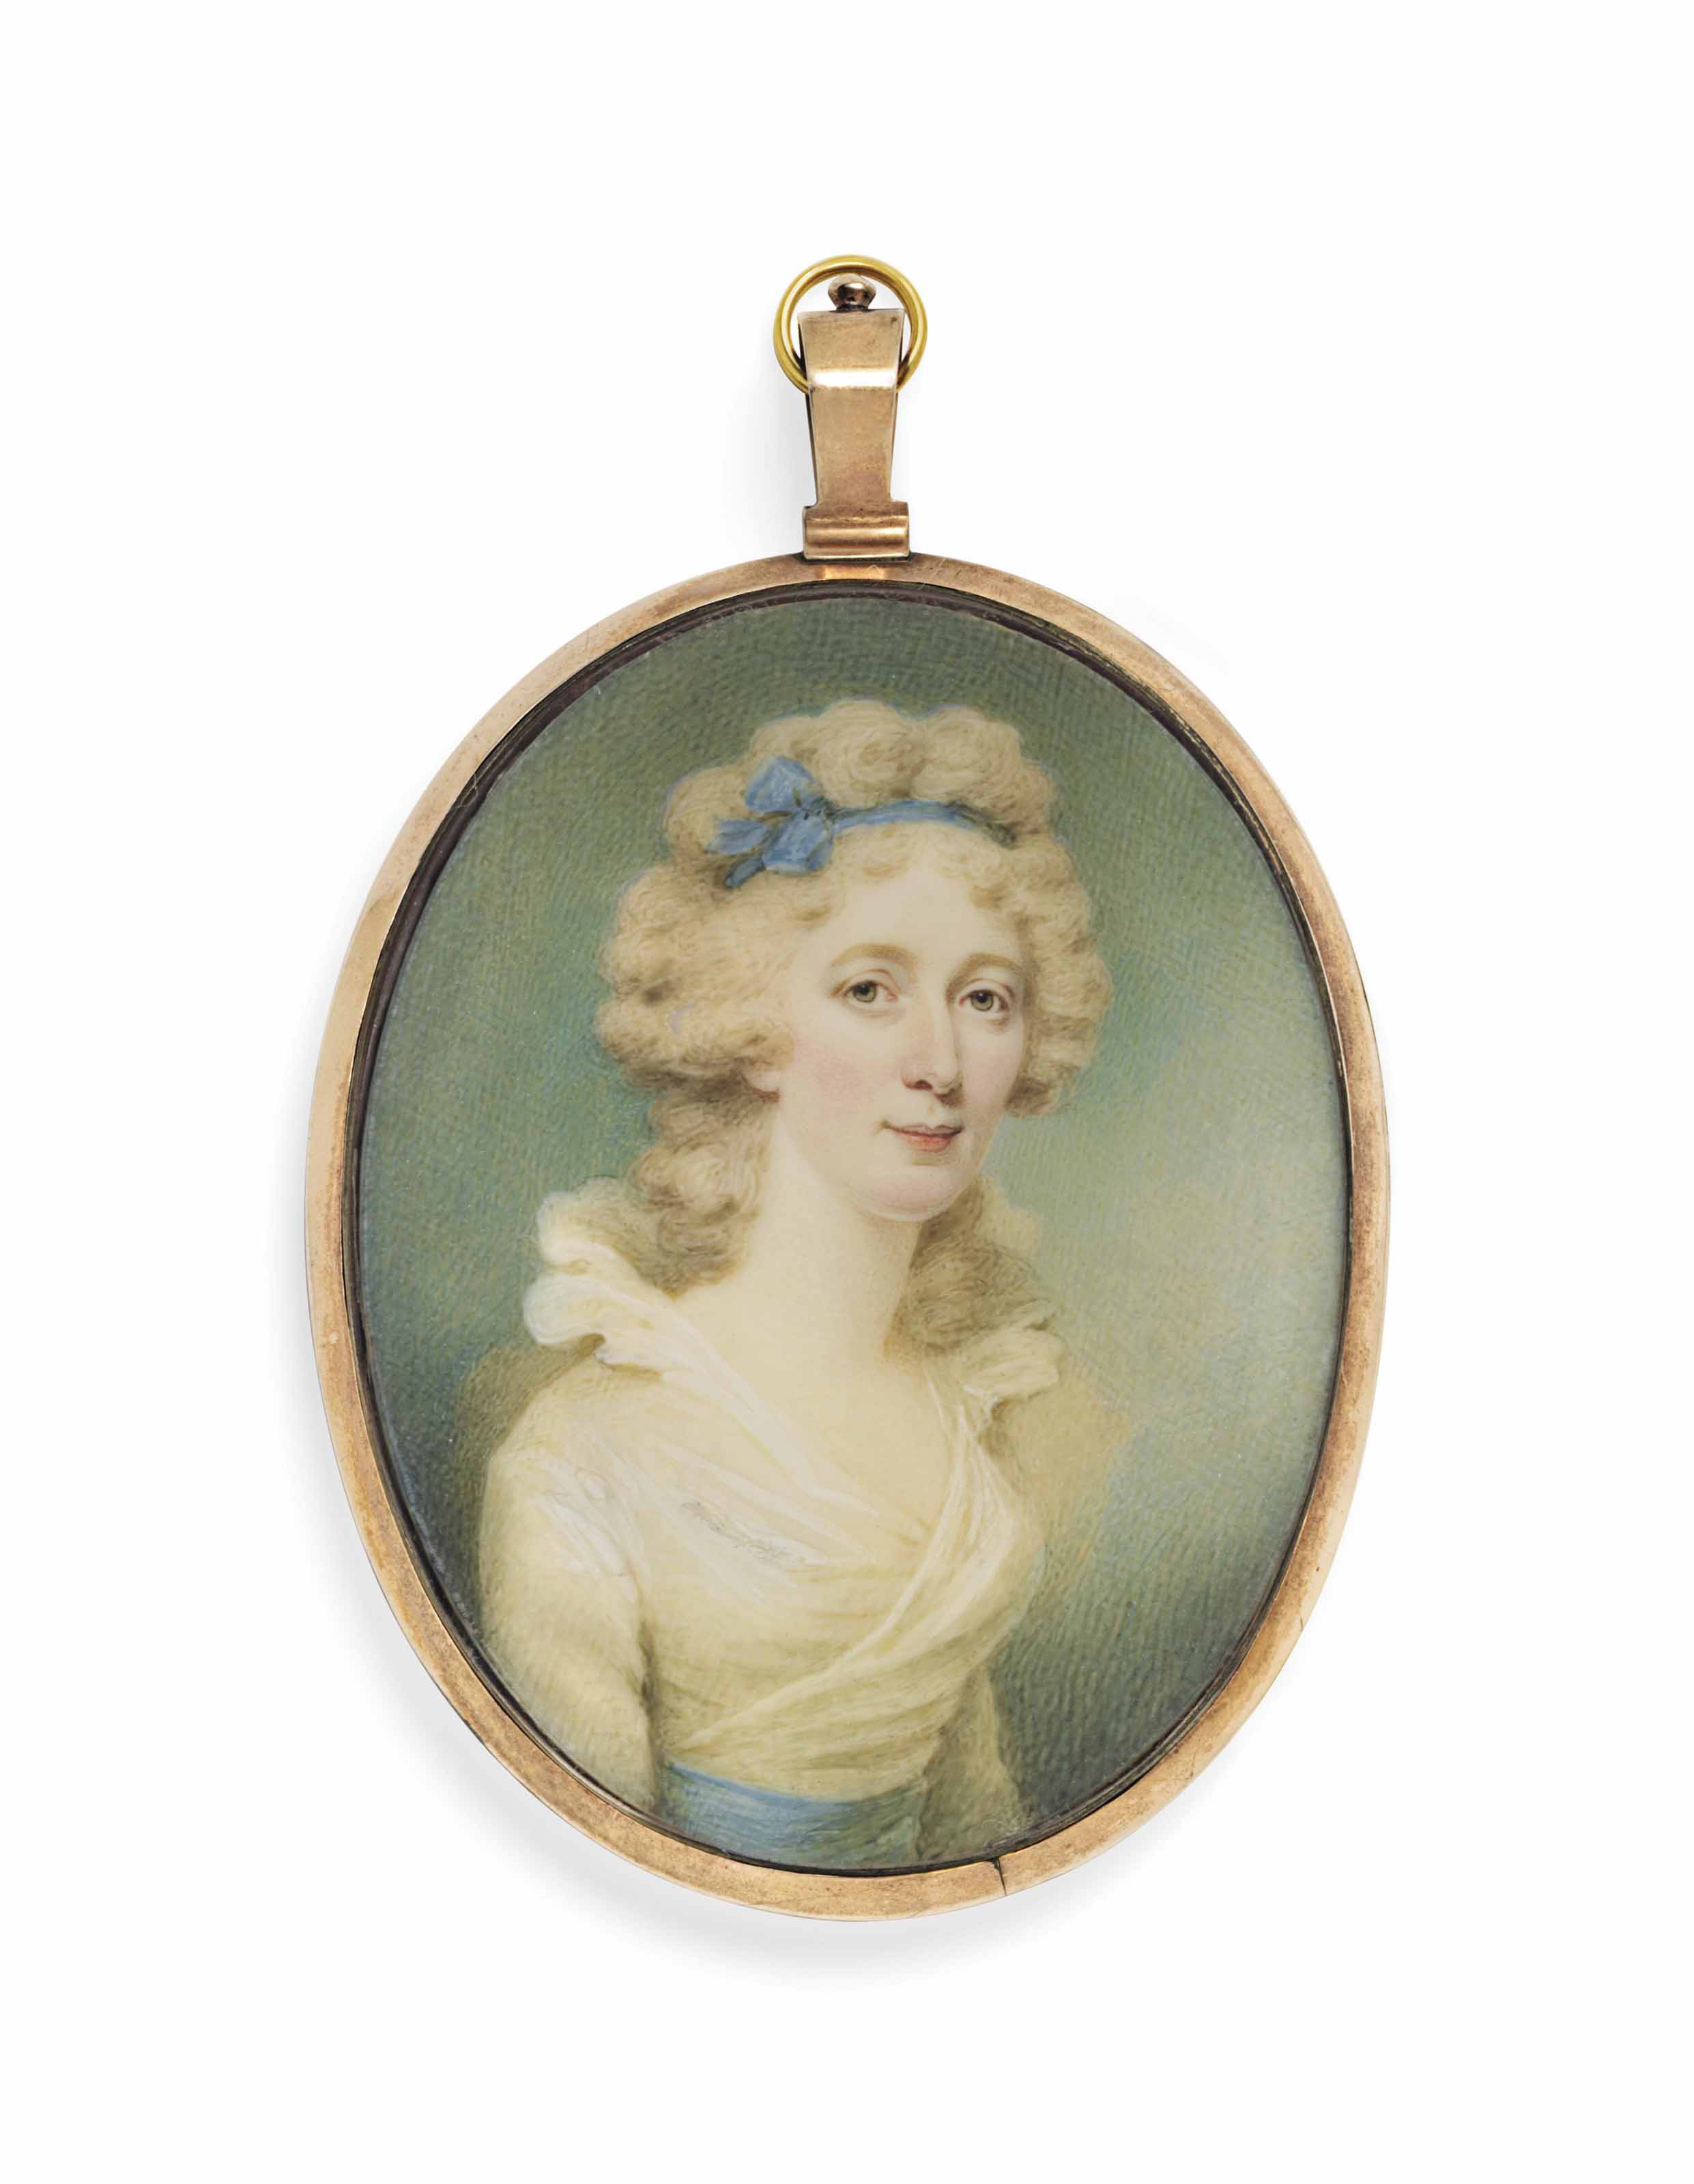 EDWARD MILES (BRITISH, 1752-1828)